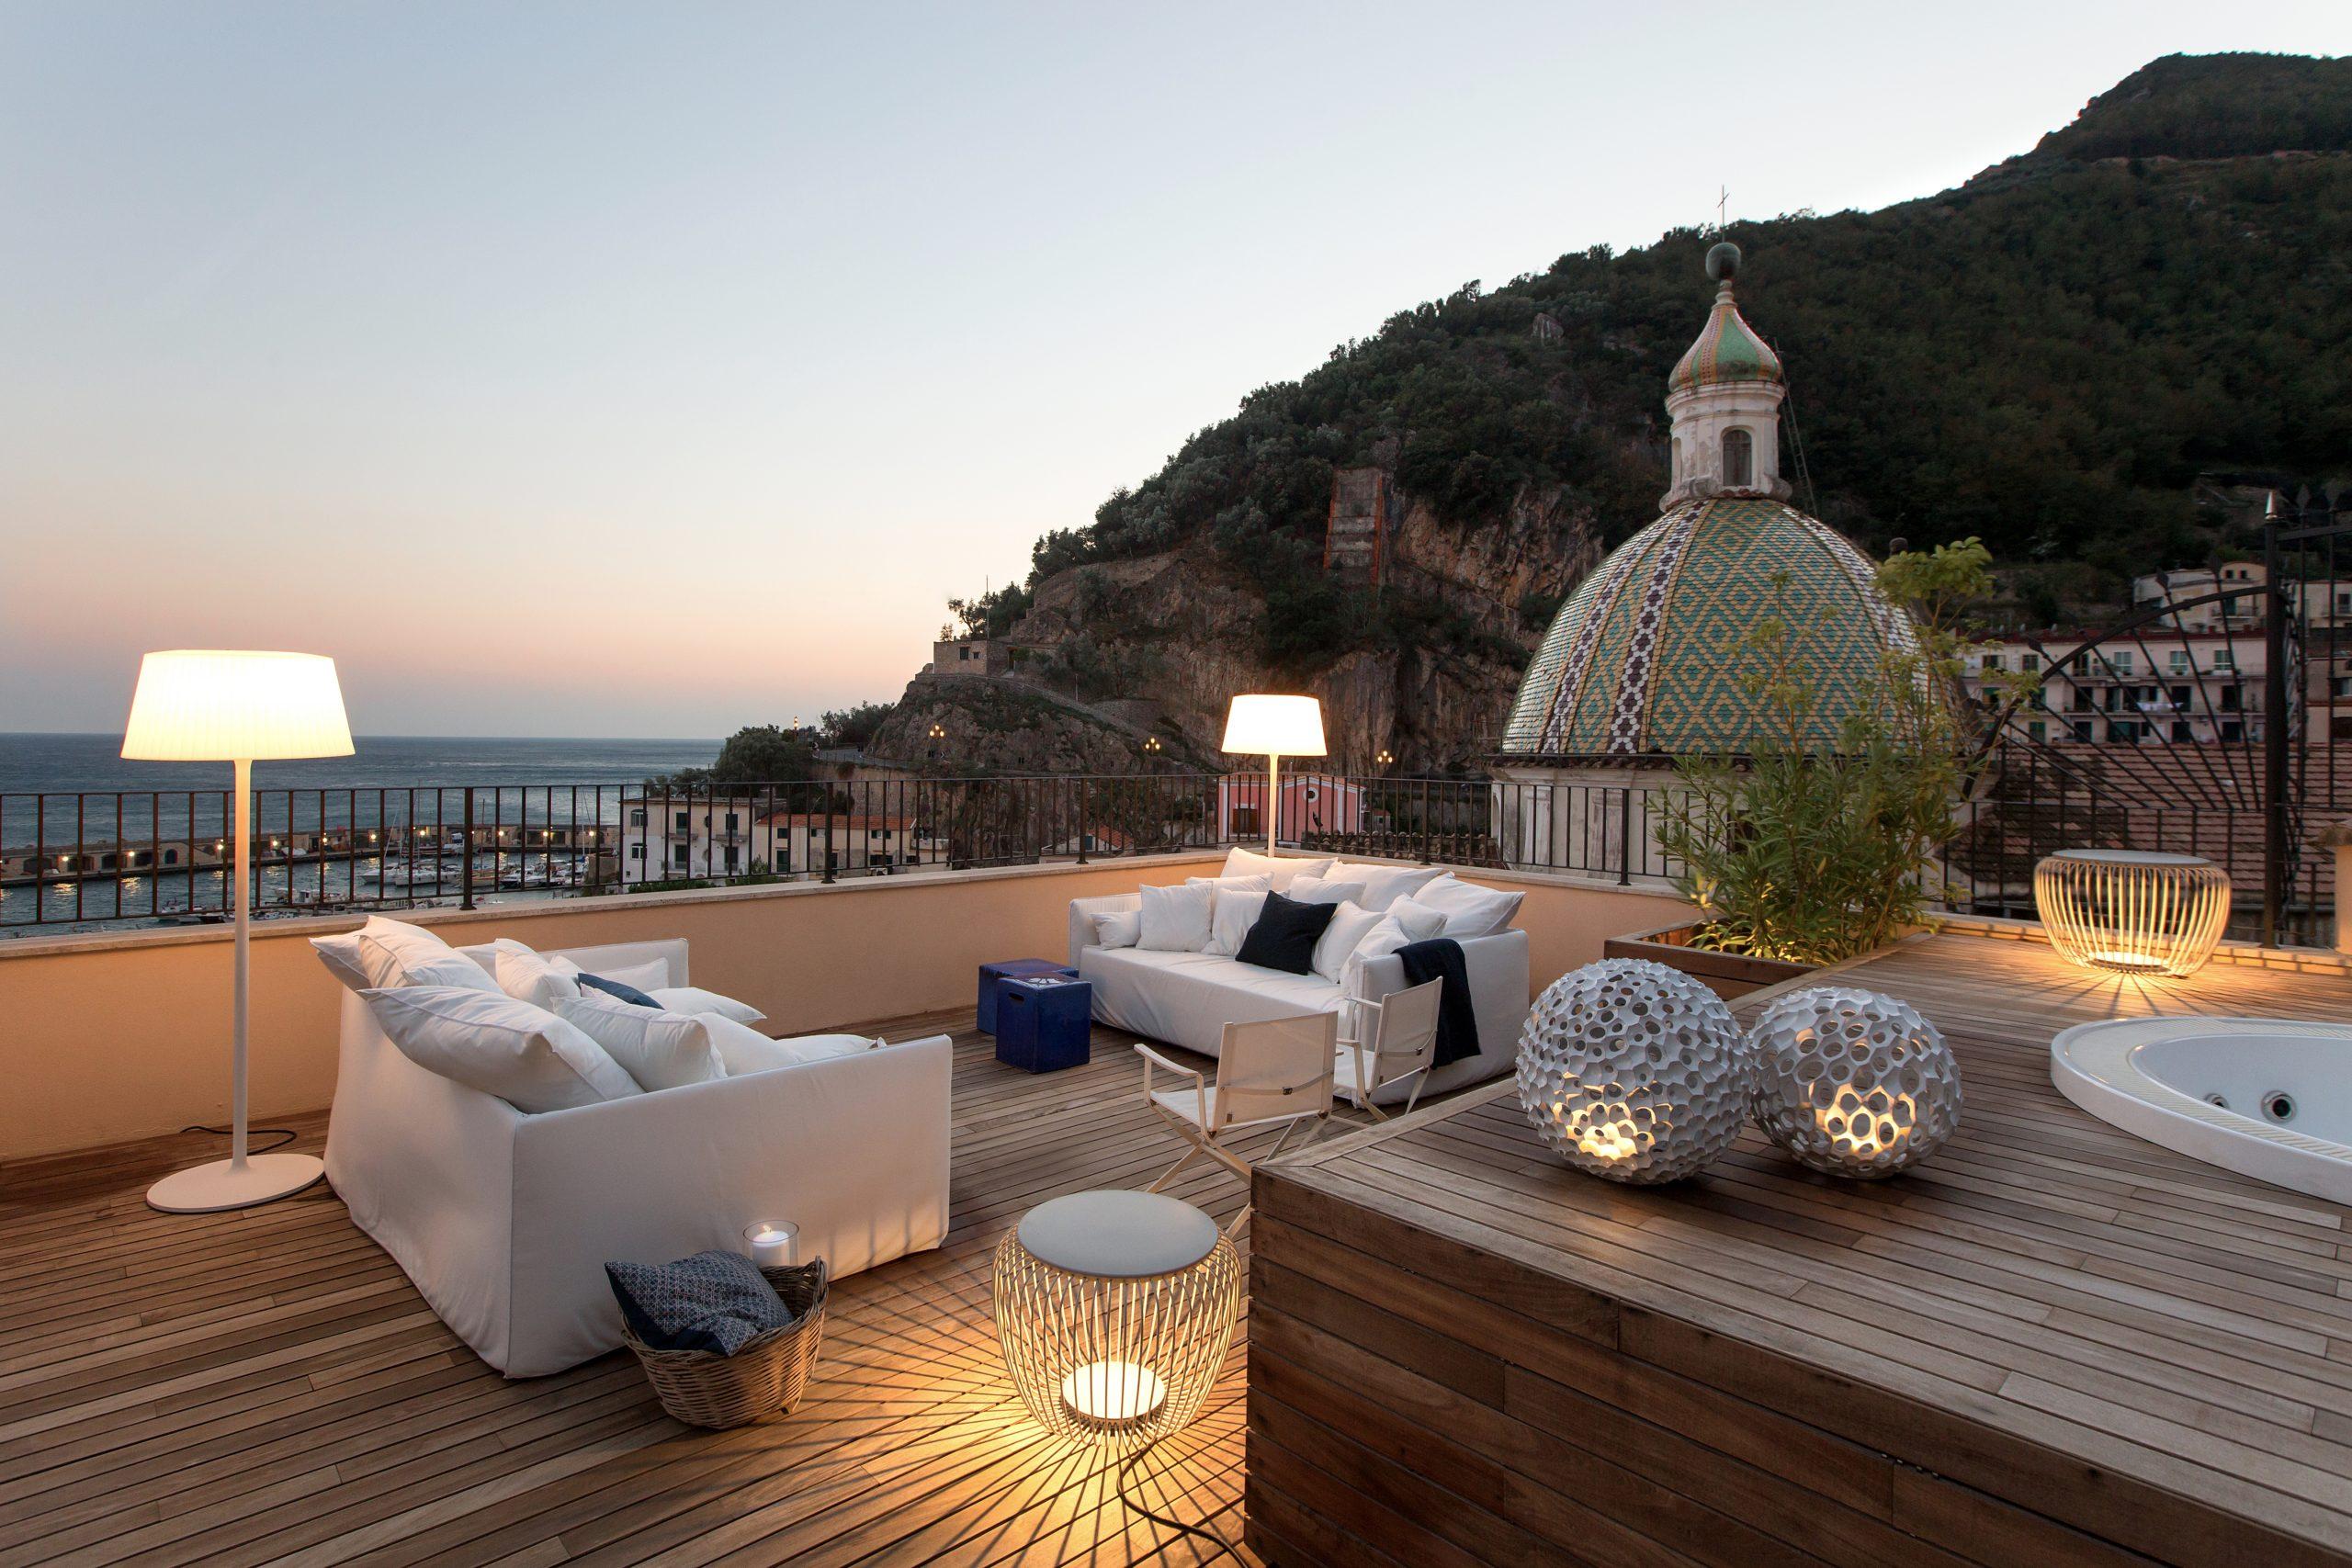 Appartamento Domotica Costiera Amalfitana